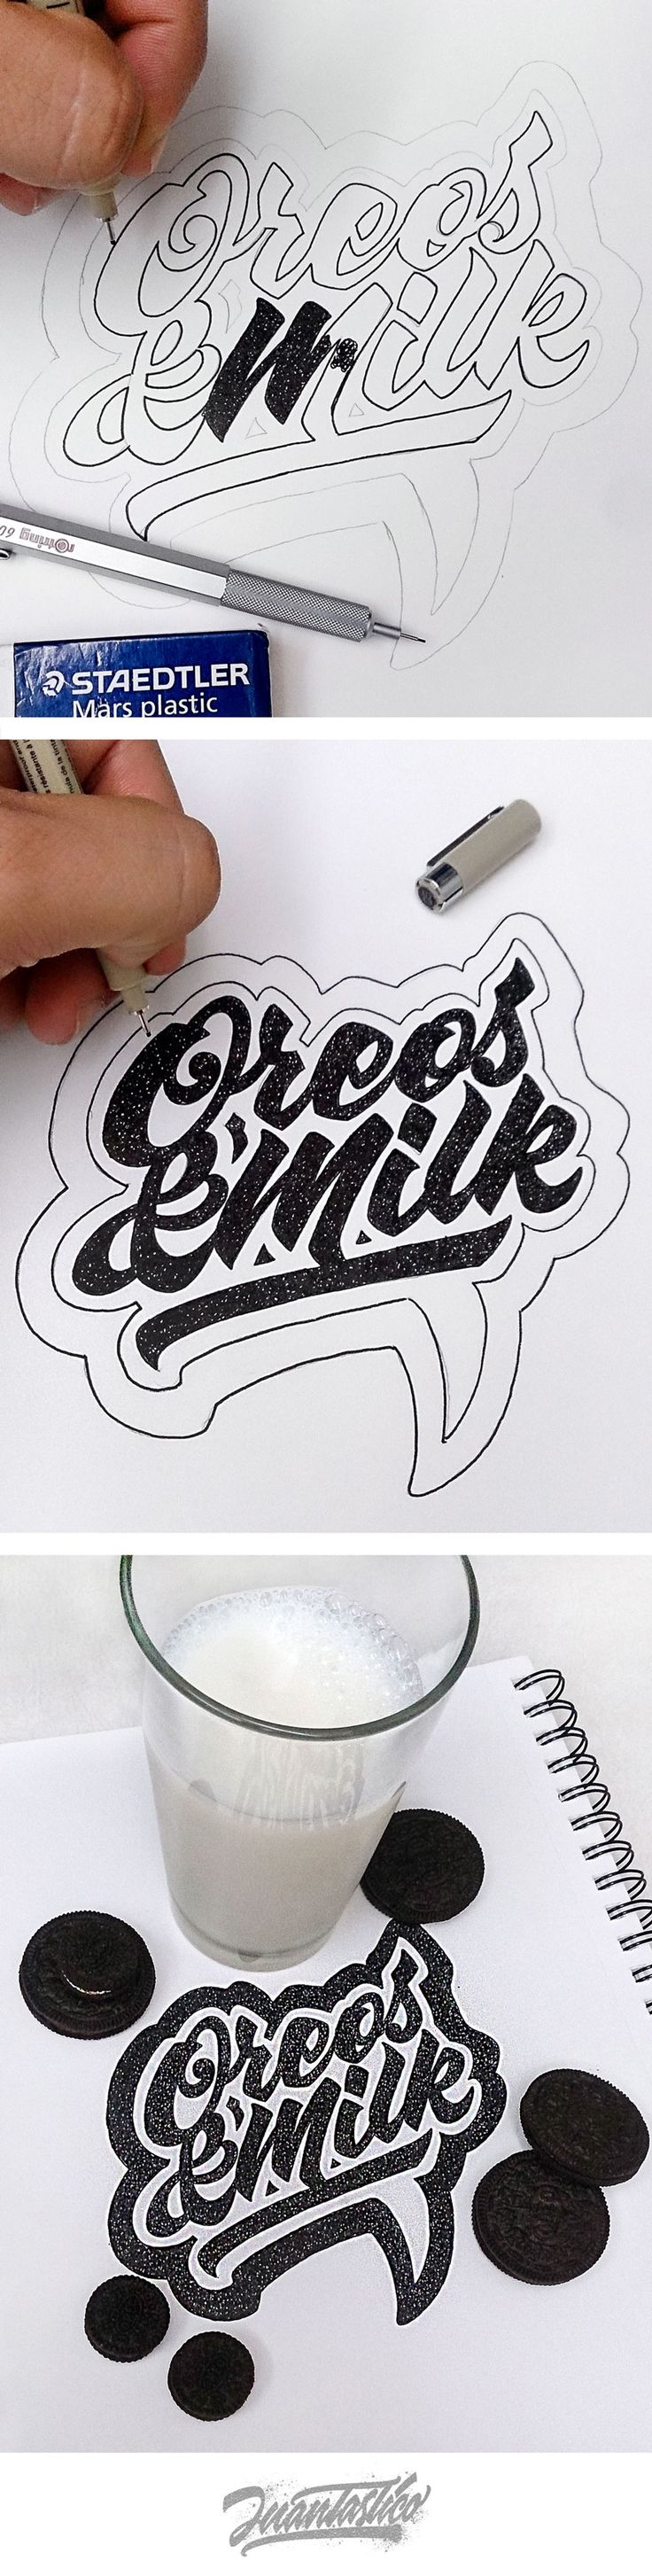 Typography Illustrations Vol.2 on Behance